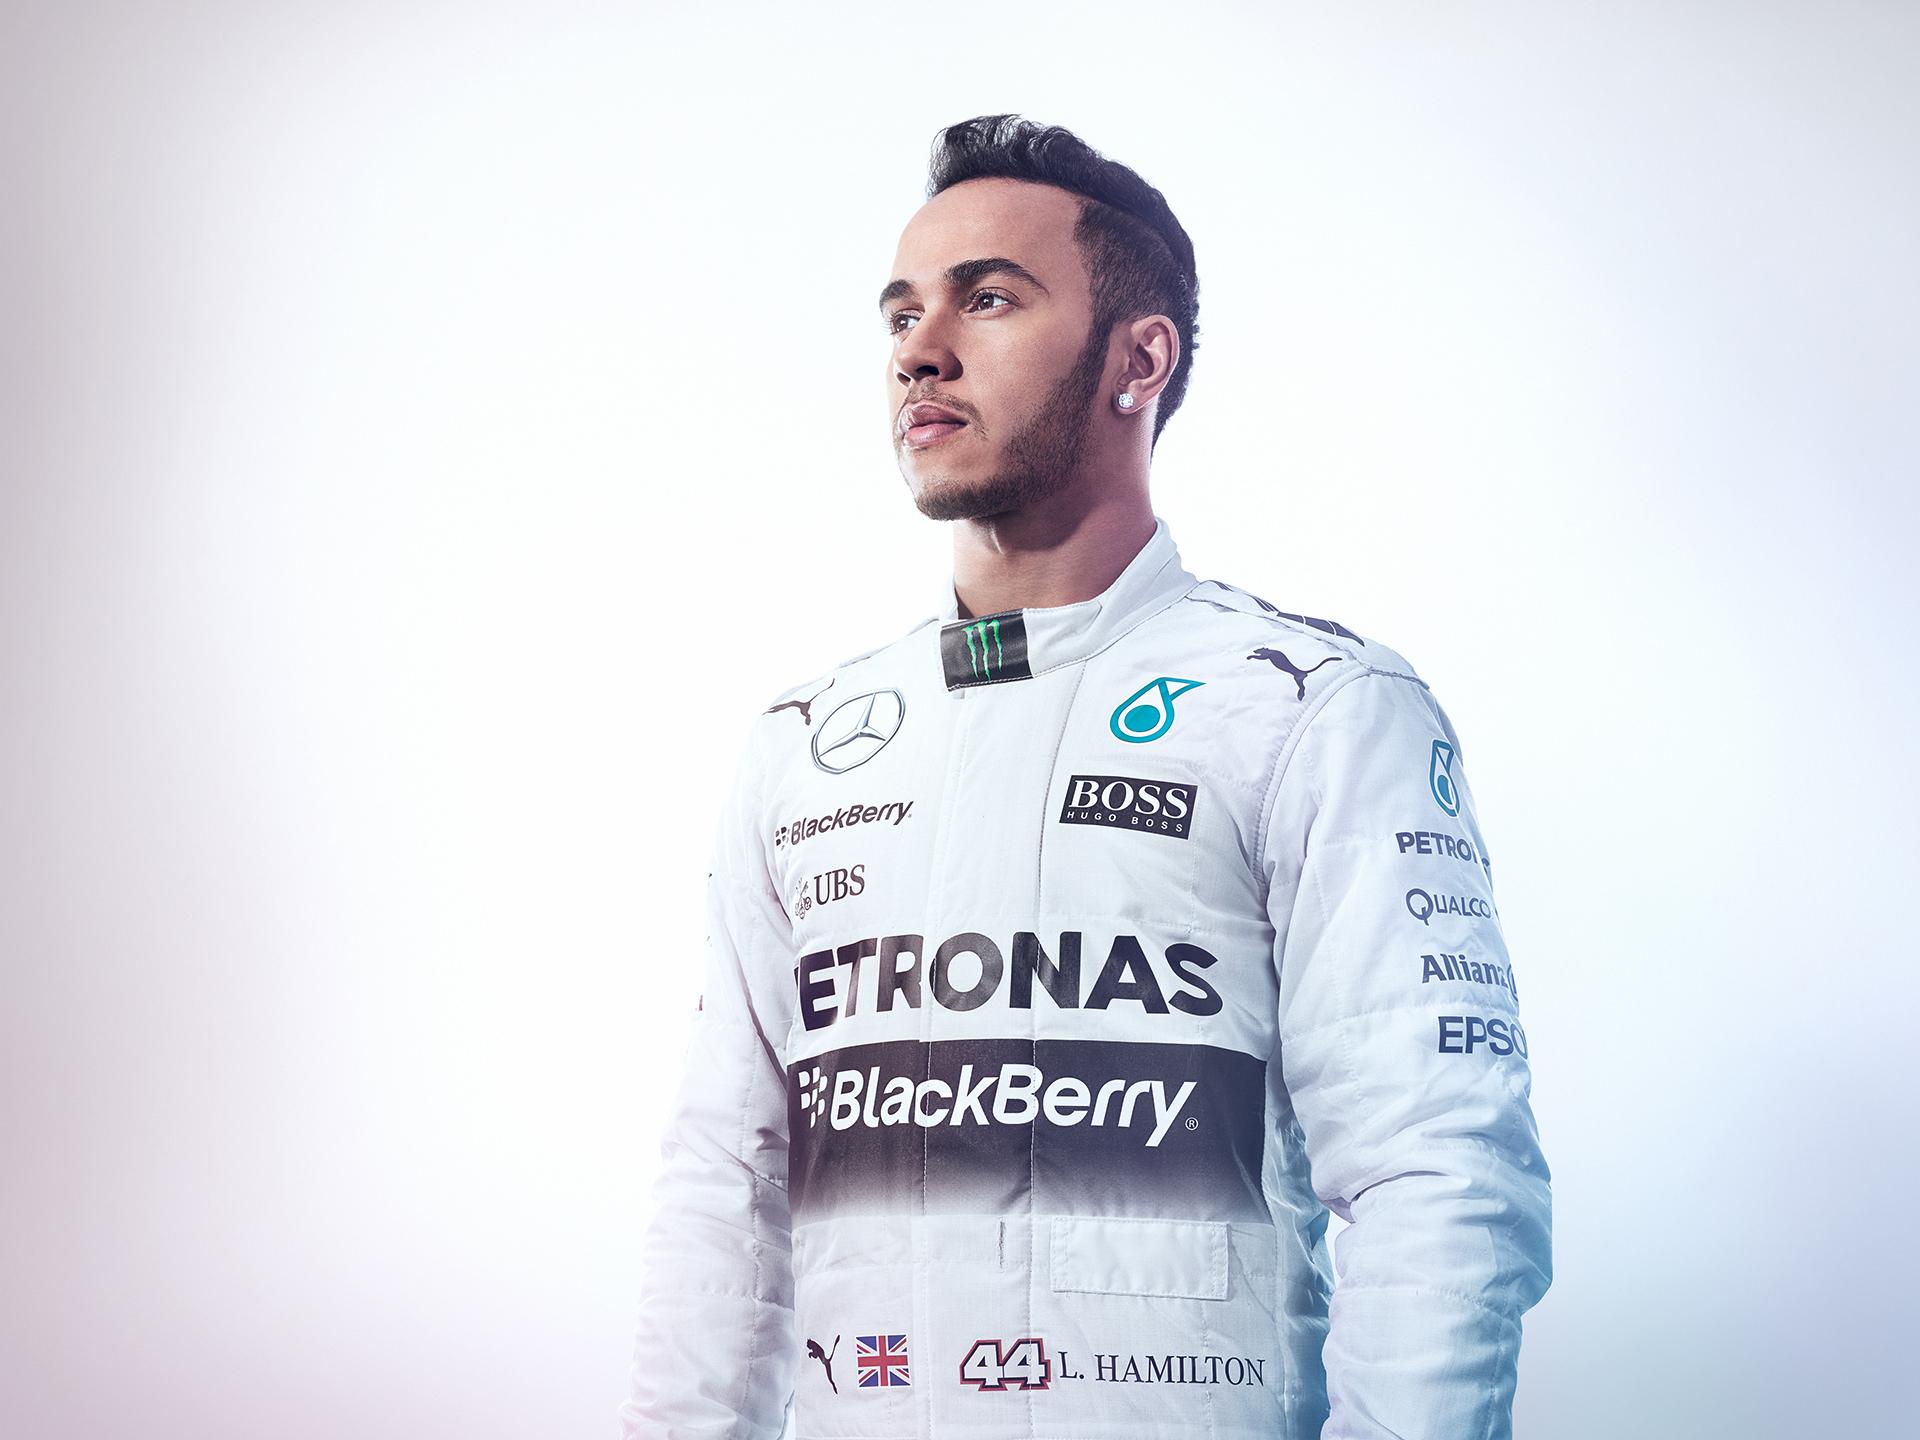 Mercedes Benz, Formel 1, F1, Barcelona, circuit de catalunya, spain, amg, Anke Luckmann, www.ankeluckmann.com, trey, Lewis Hamilton